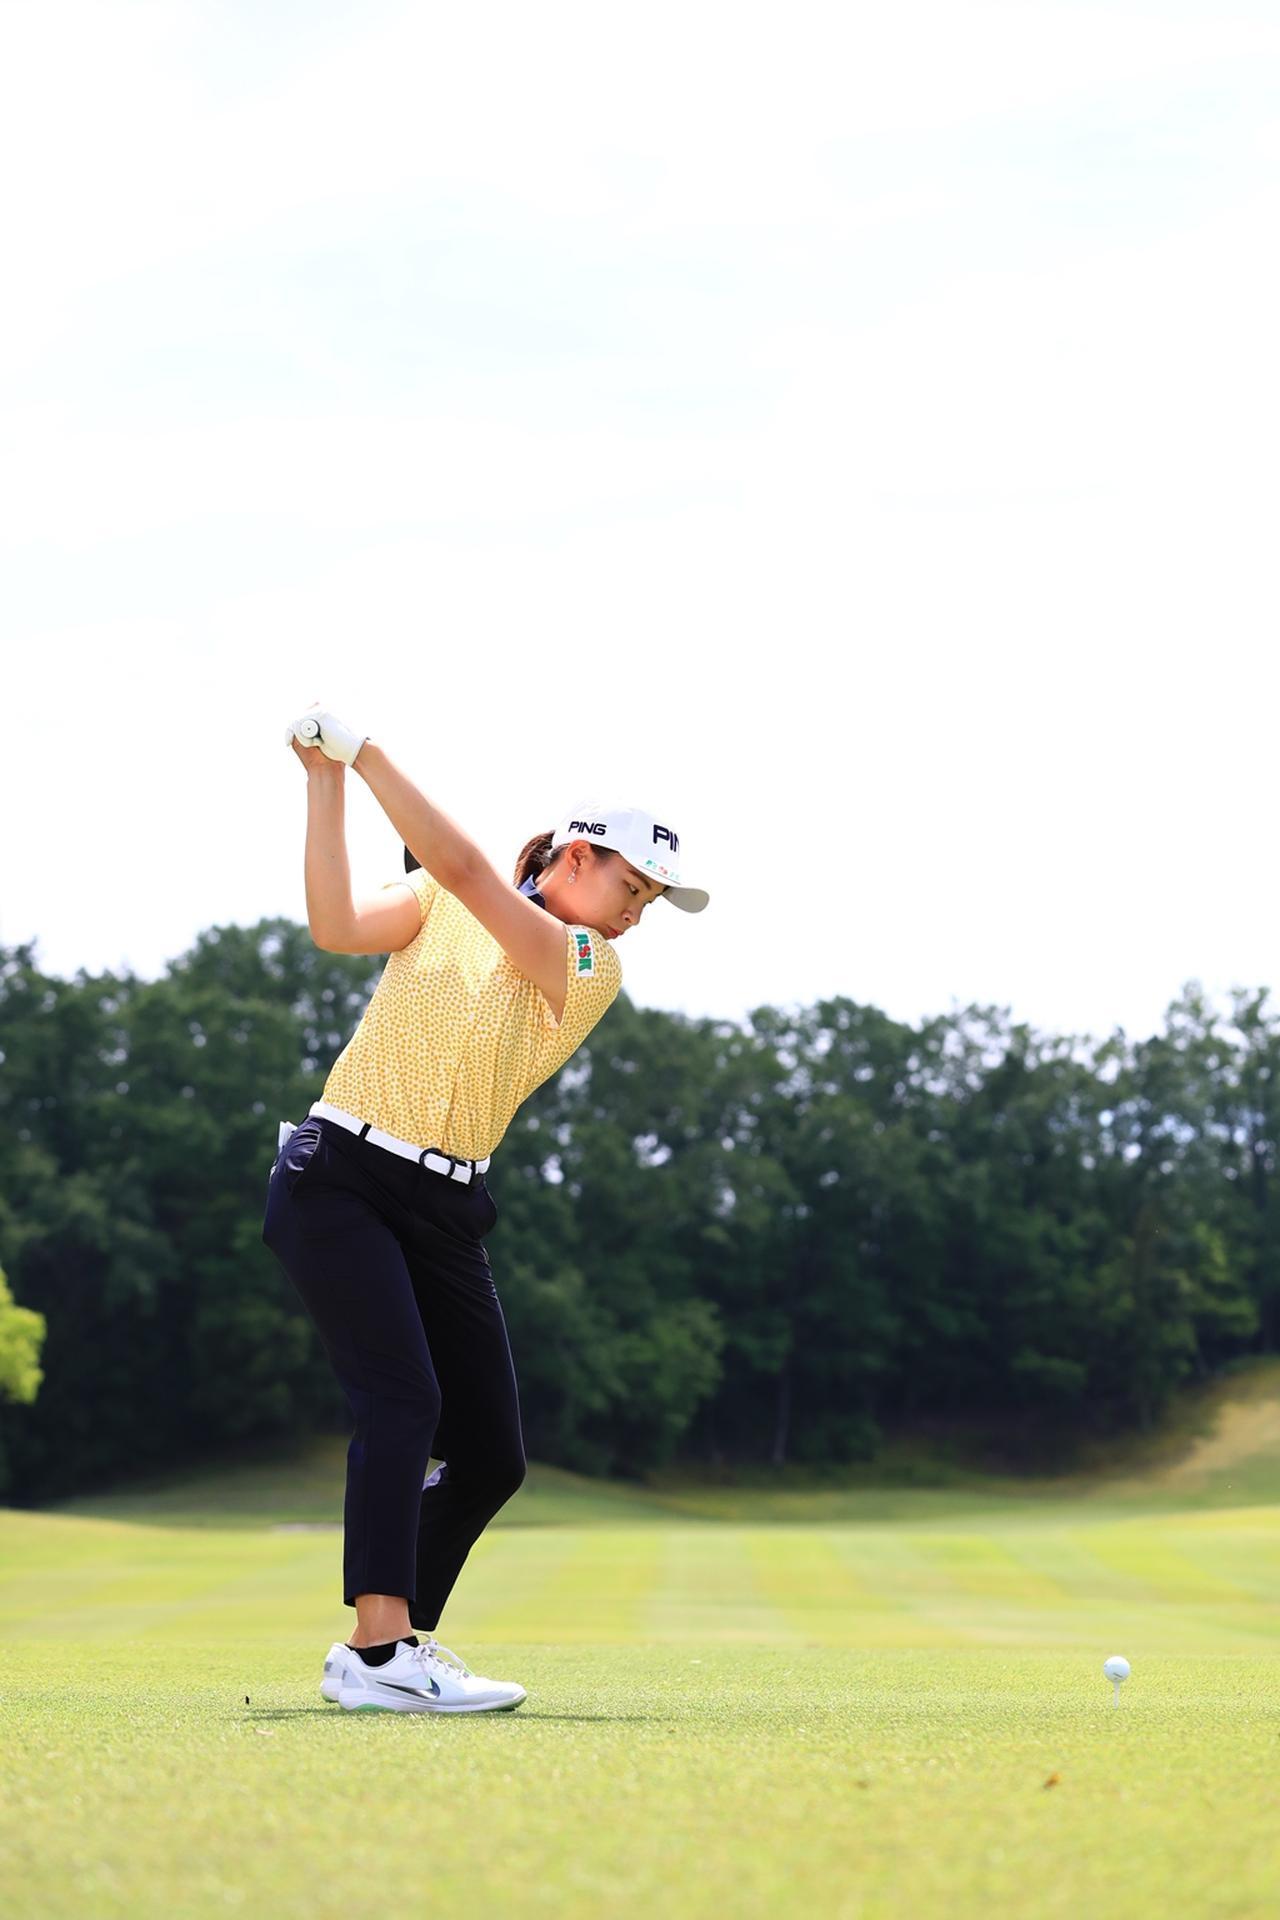 Images : 10番目の画像 - 渋野日向子のドライバー後方連続写真 - みんなのゴルフダイジェスト